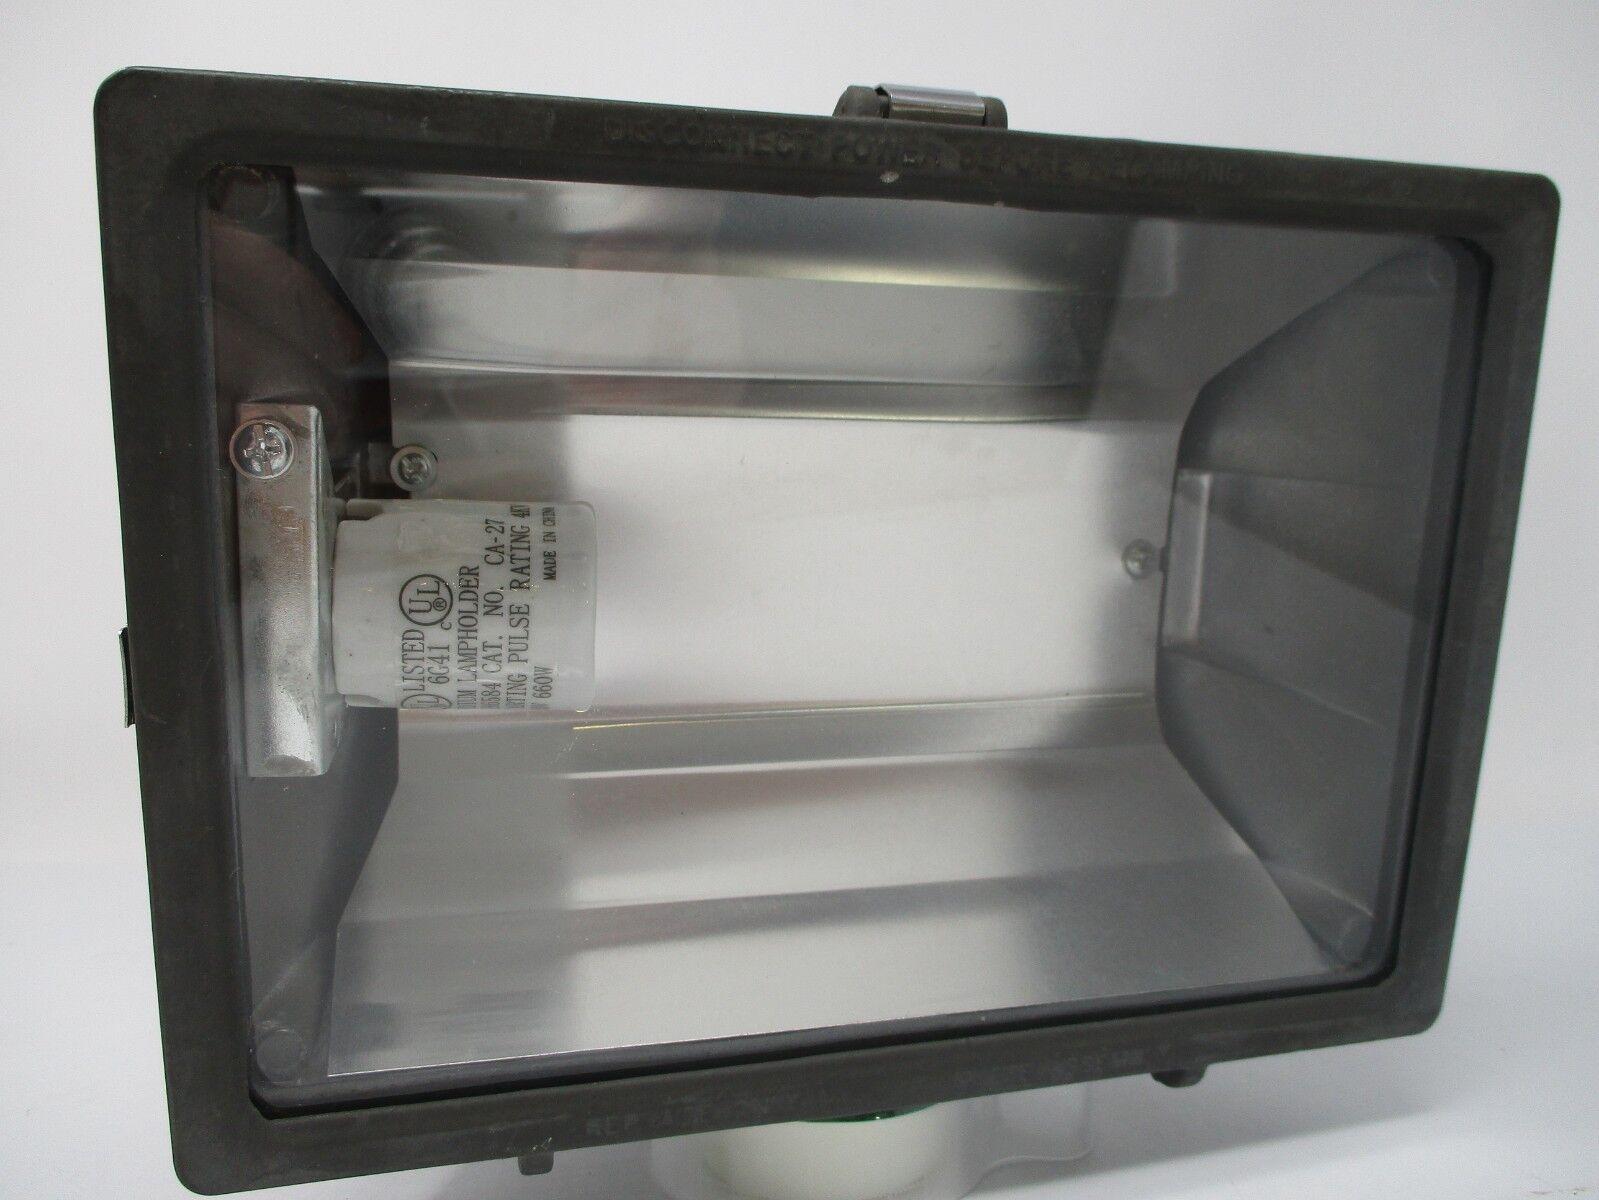 Lithonia Outdoor High-Pressure Sodium Flood Light Bronze OFL 70S 120 P LP BZ